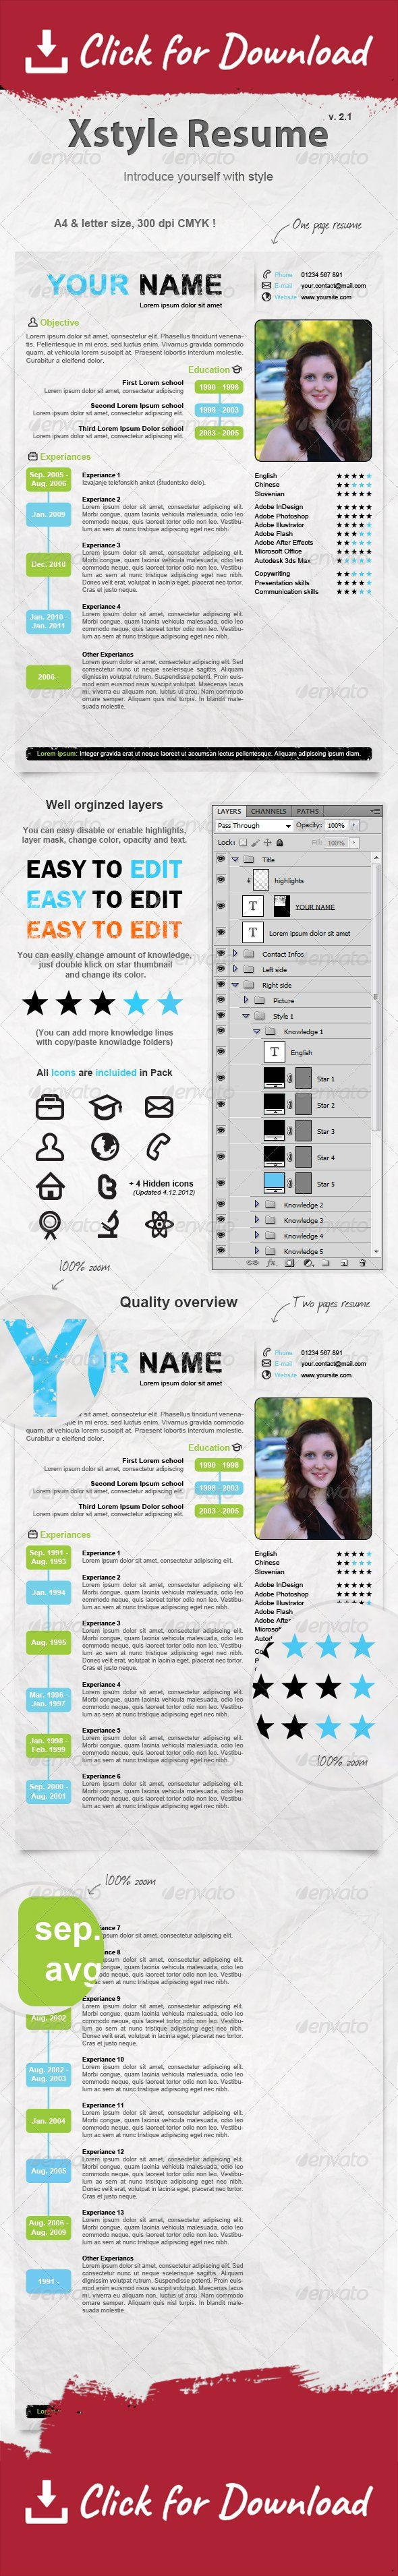 45 best Resumes images on Pinterest | Cv template, Design resume ...